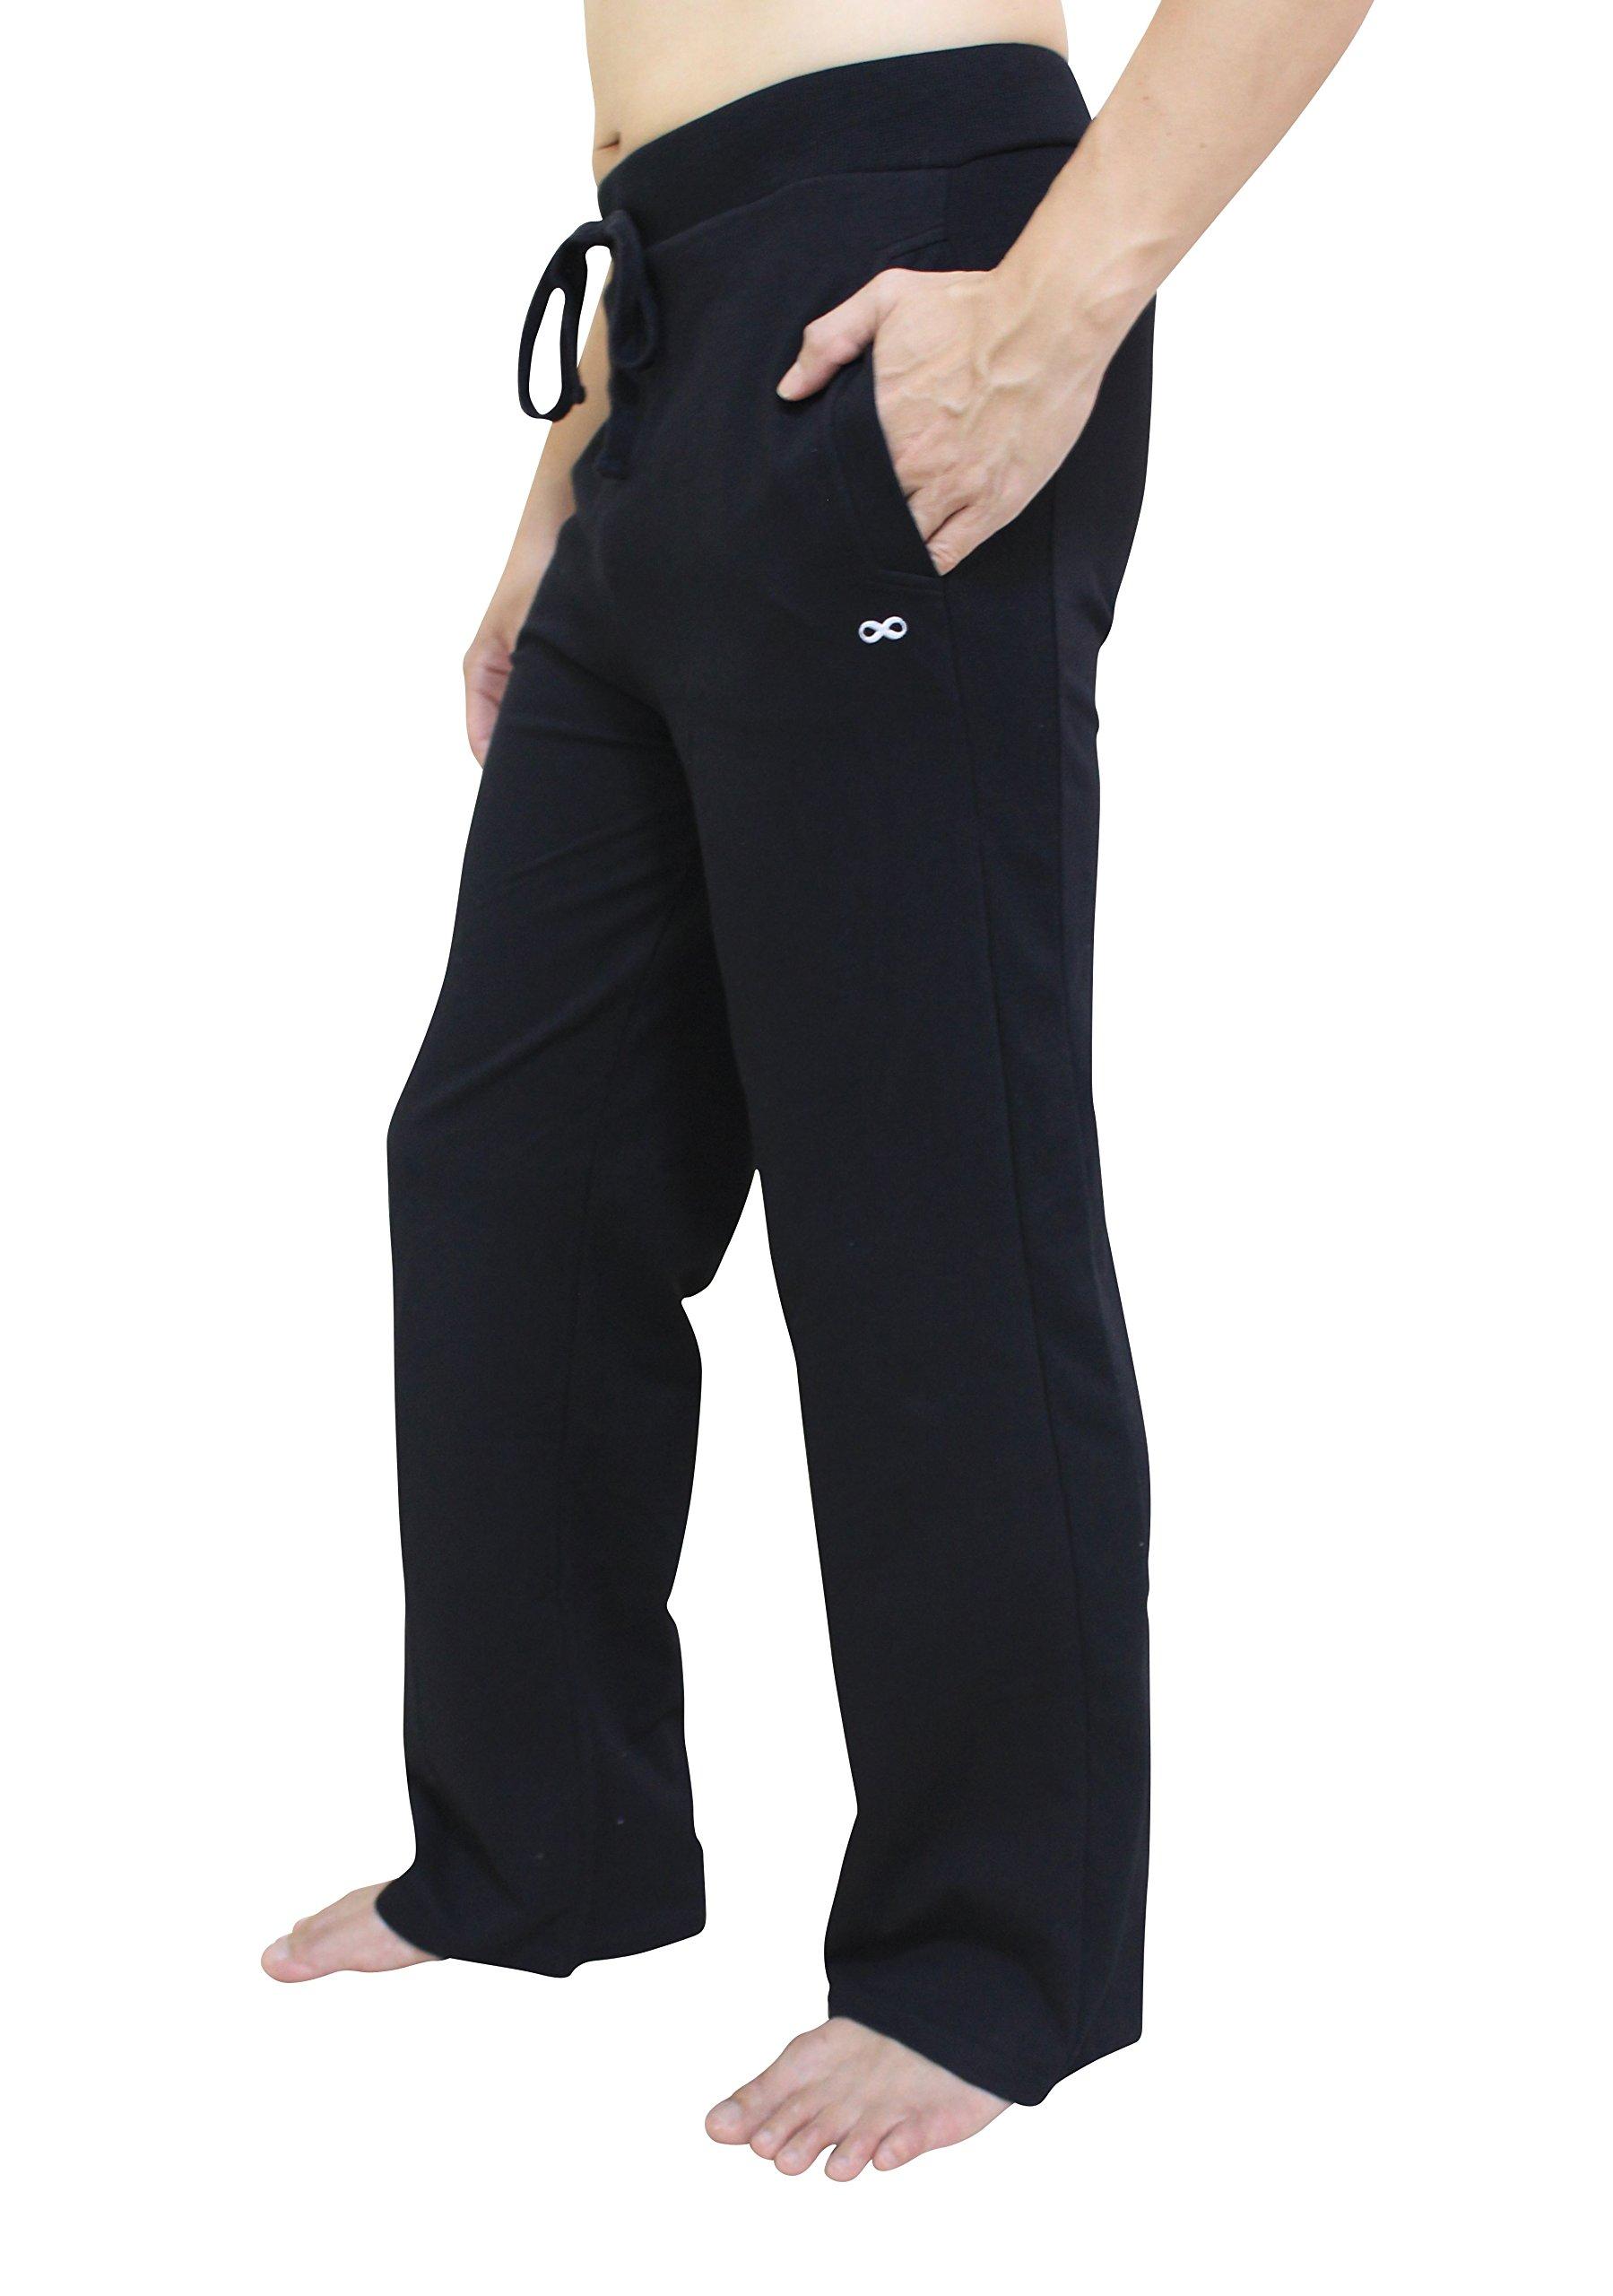 YogaAddict Men's Yoga Long Pants, Black - Size M by YogaAddict